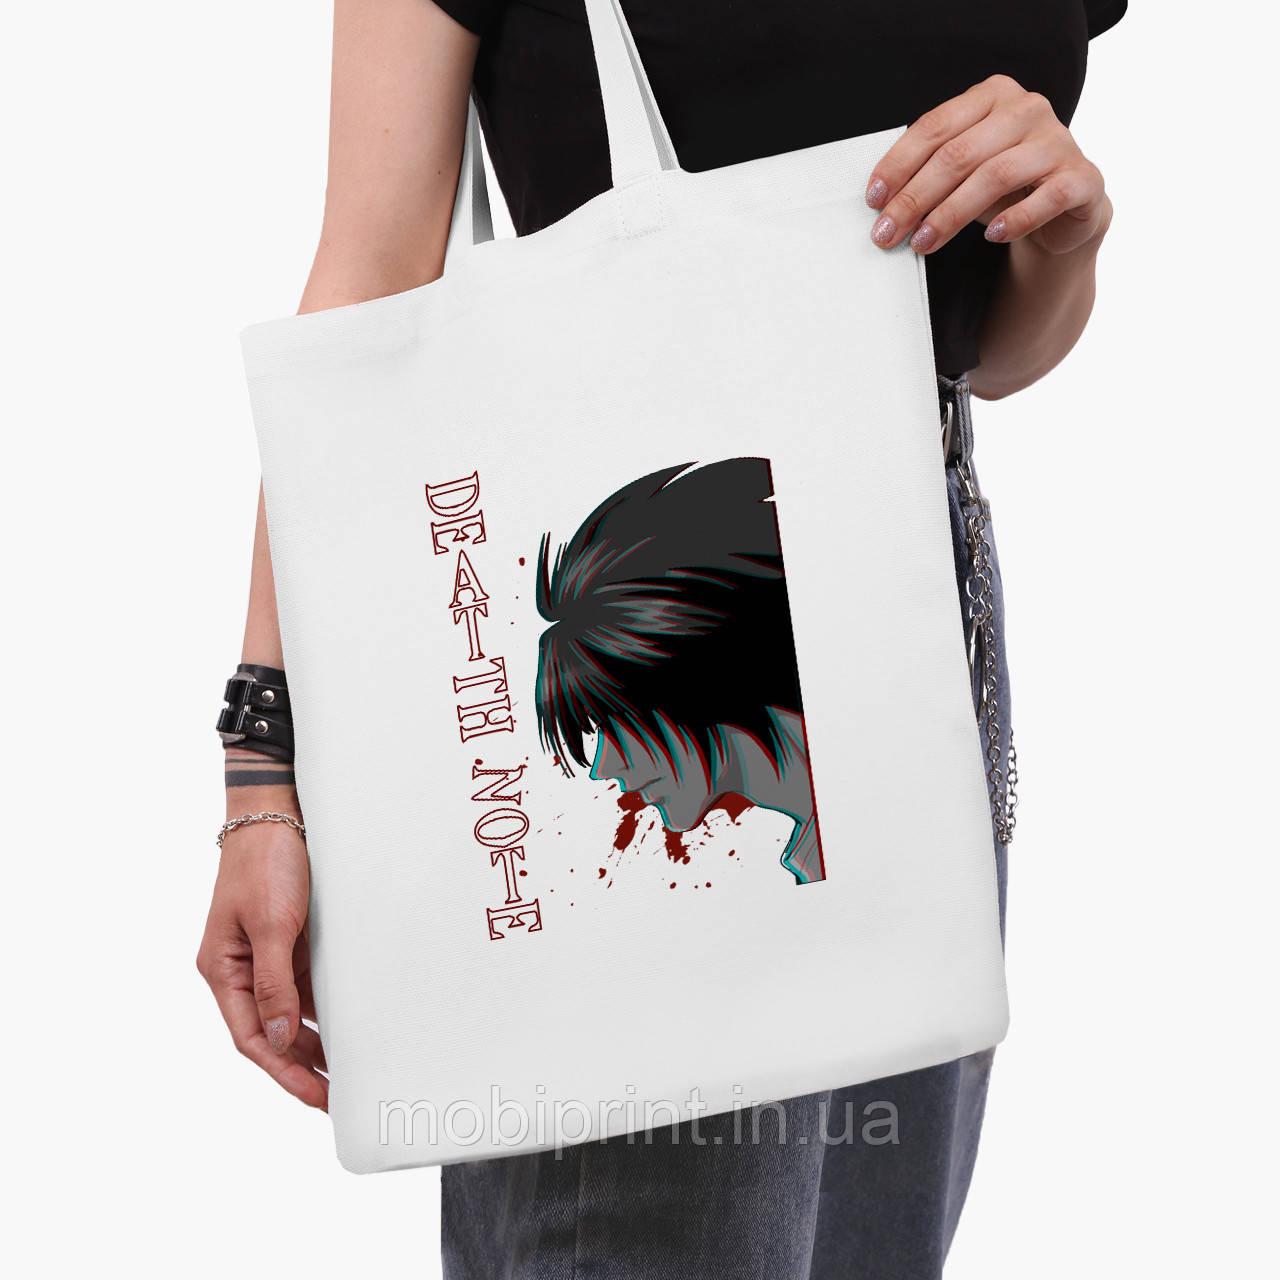 Эко сумка шоппер белая Эл Лоулайт Тетрадь смерти (L Death Note) (9227-2824-3)  41*35 см